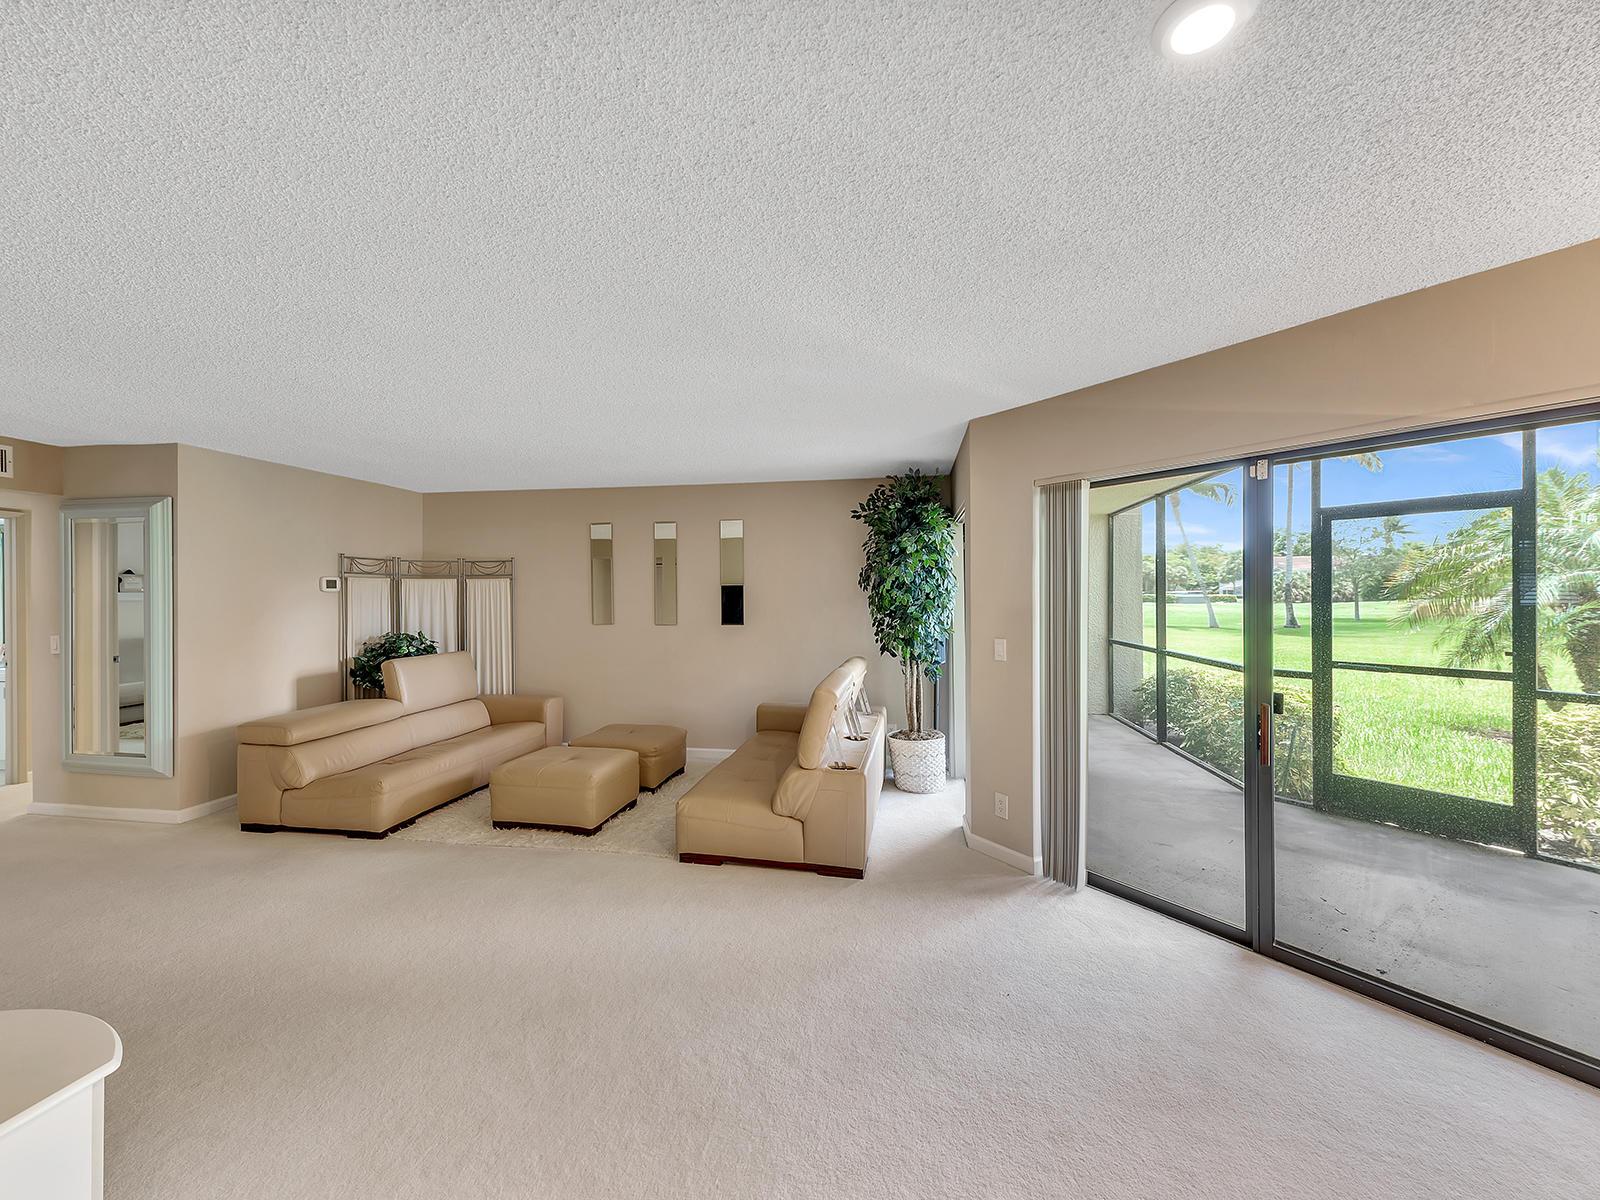 Home for sale in Camino Real Village Boca Raton Florida